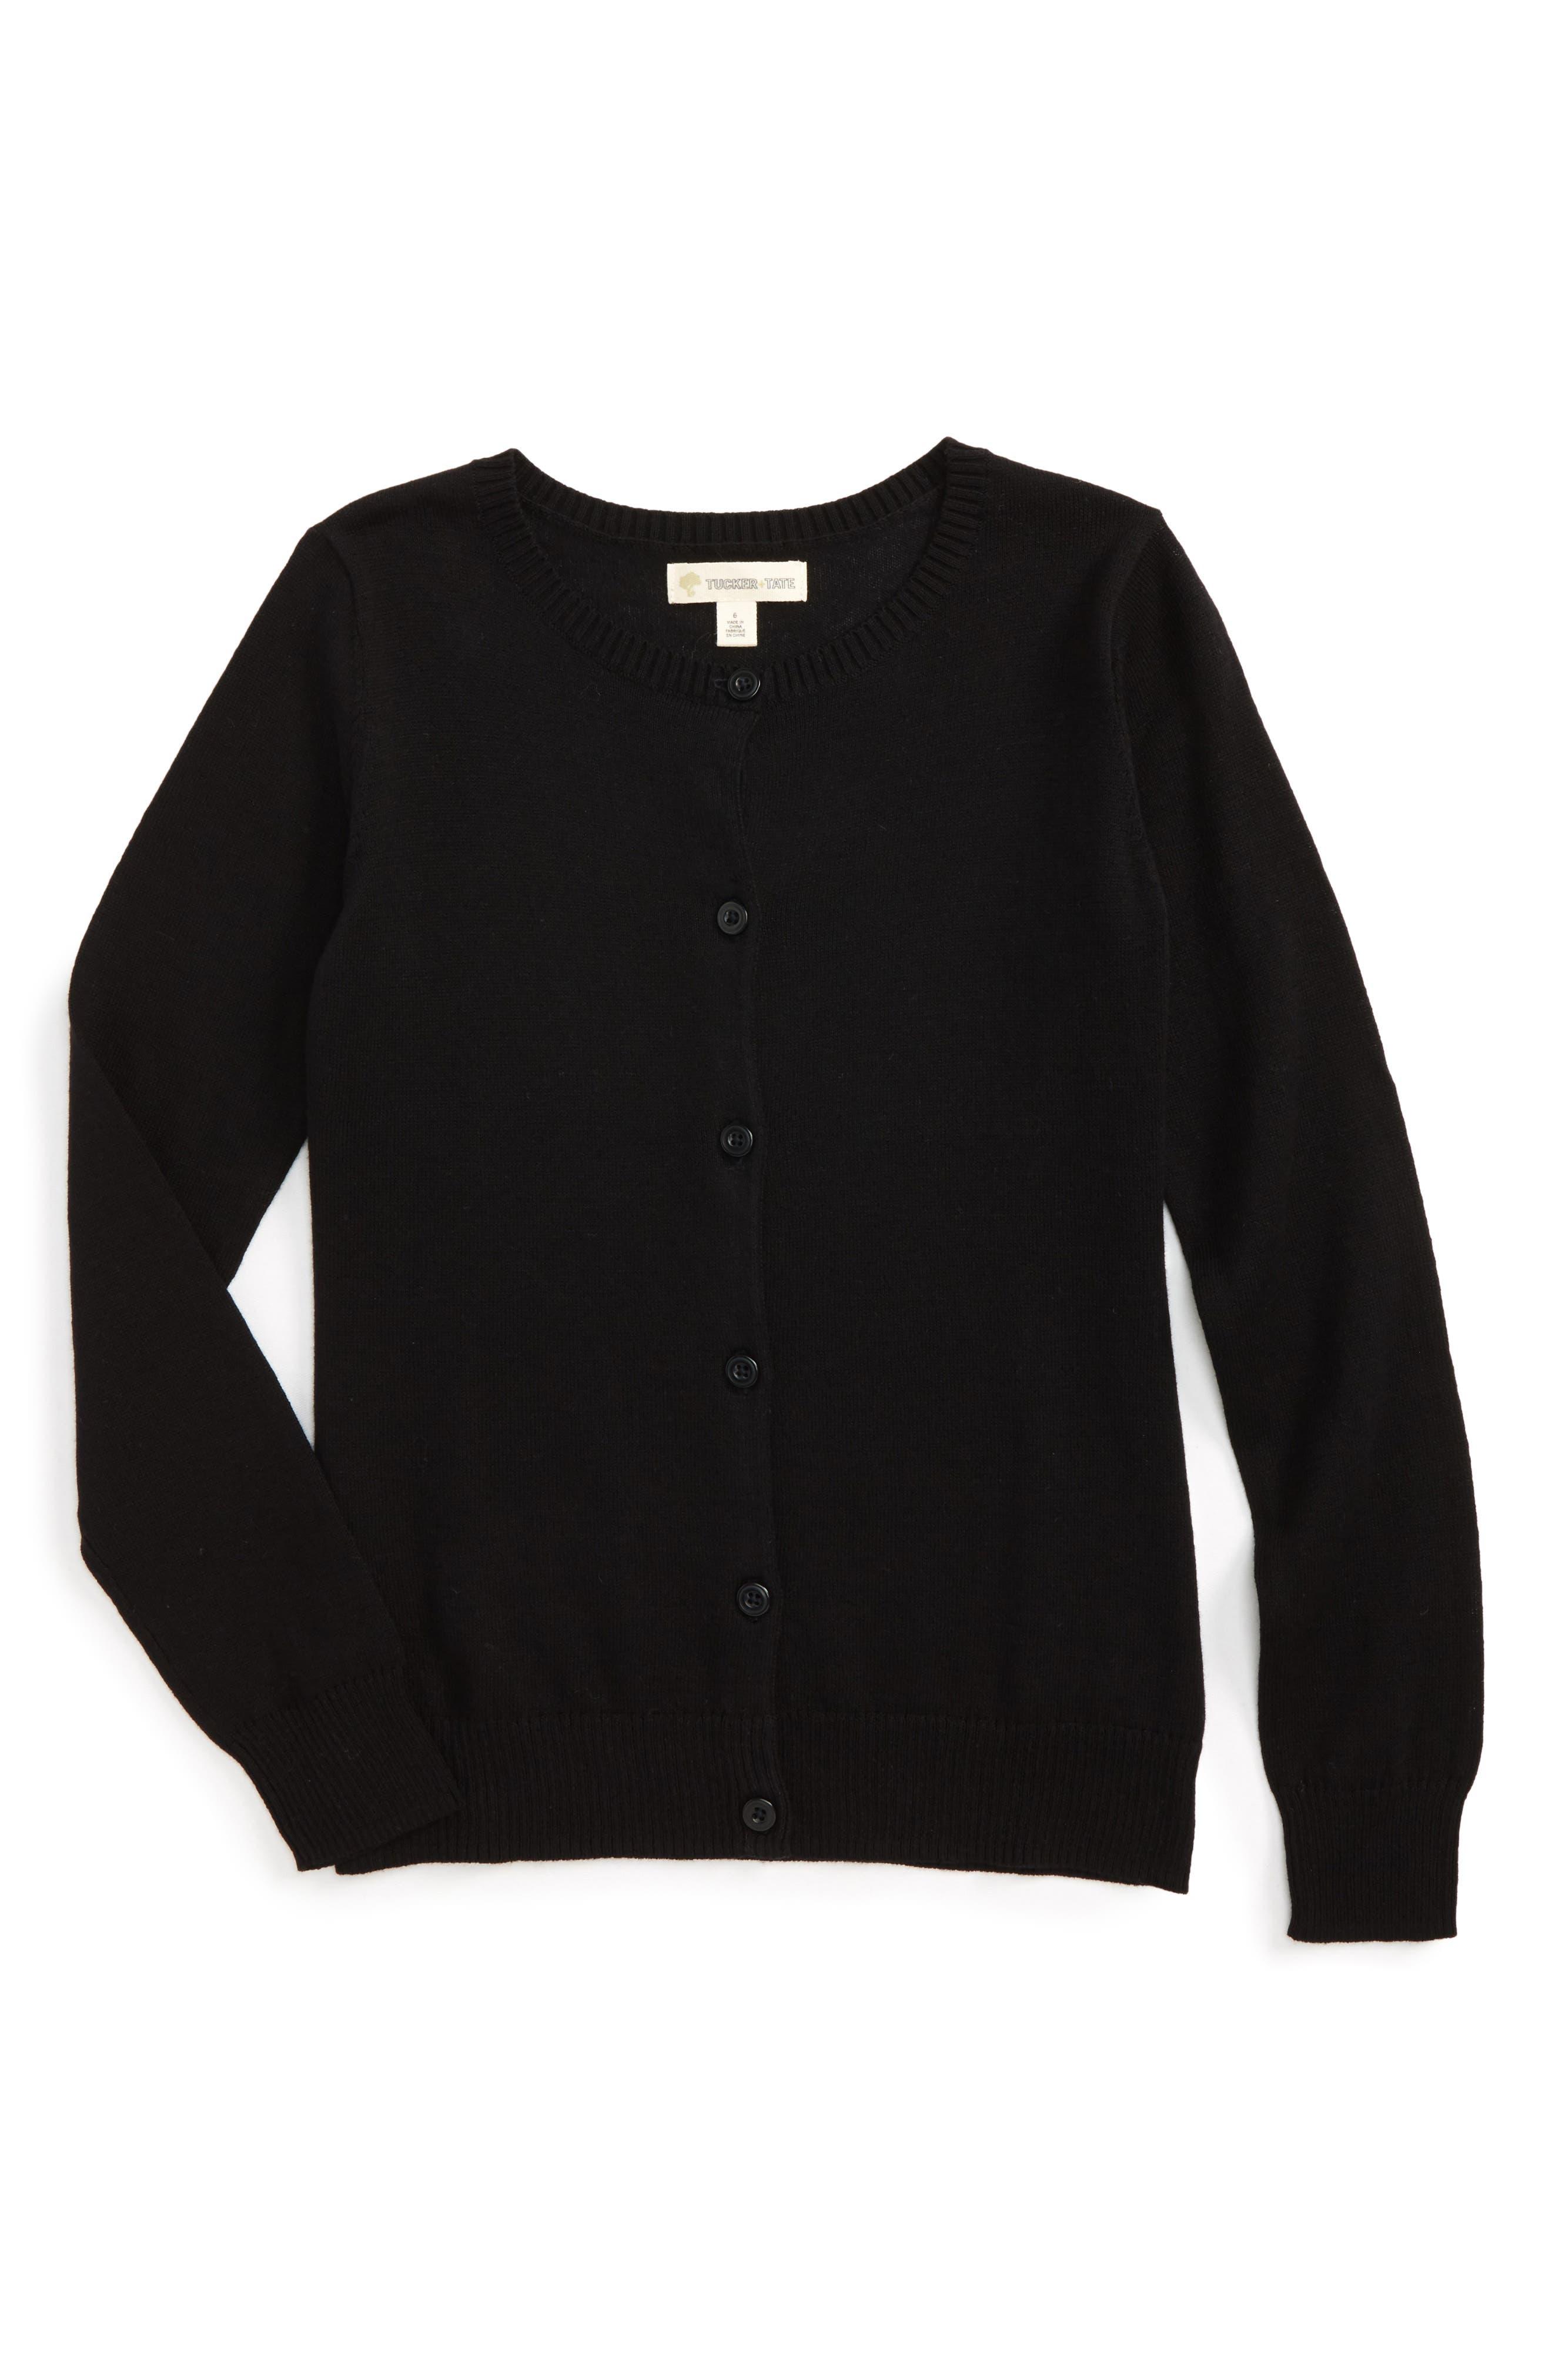 Girls Tucker  Tate Jane Cotton Cardigan Size 5  Black